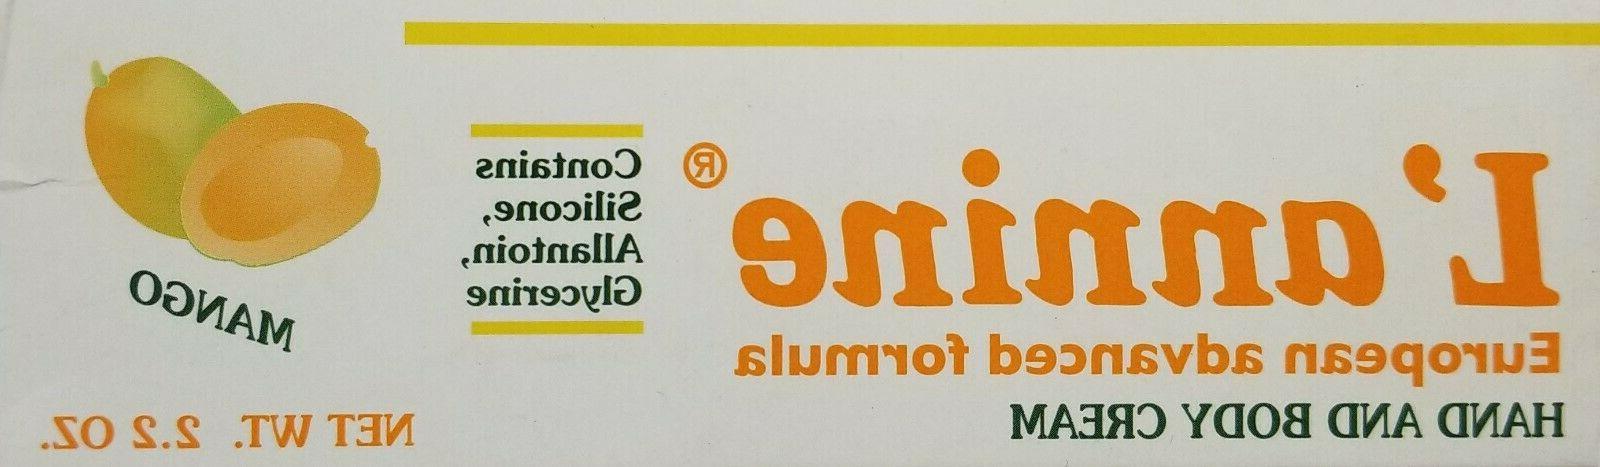 L'annine Hand & body cream European formula Mango 2.2 oz. la